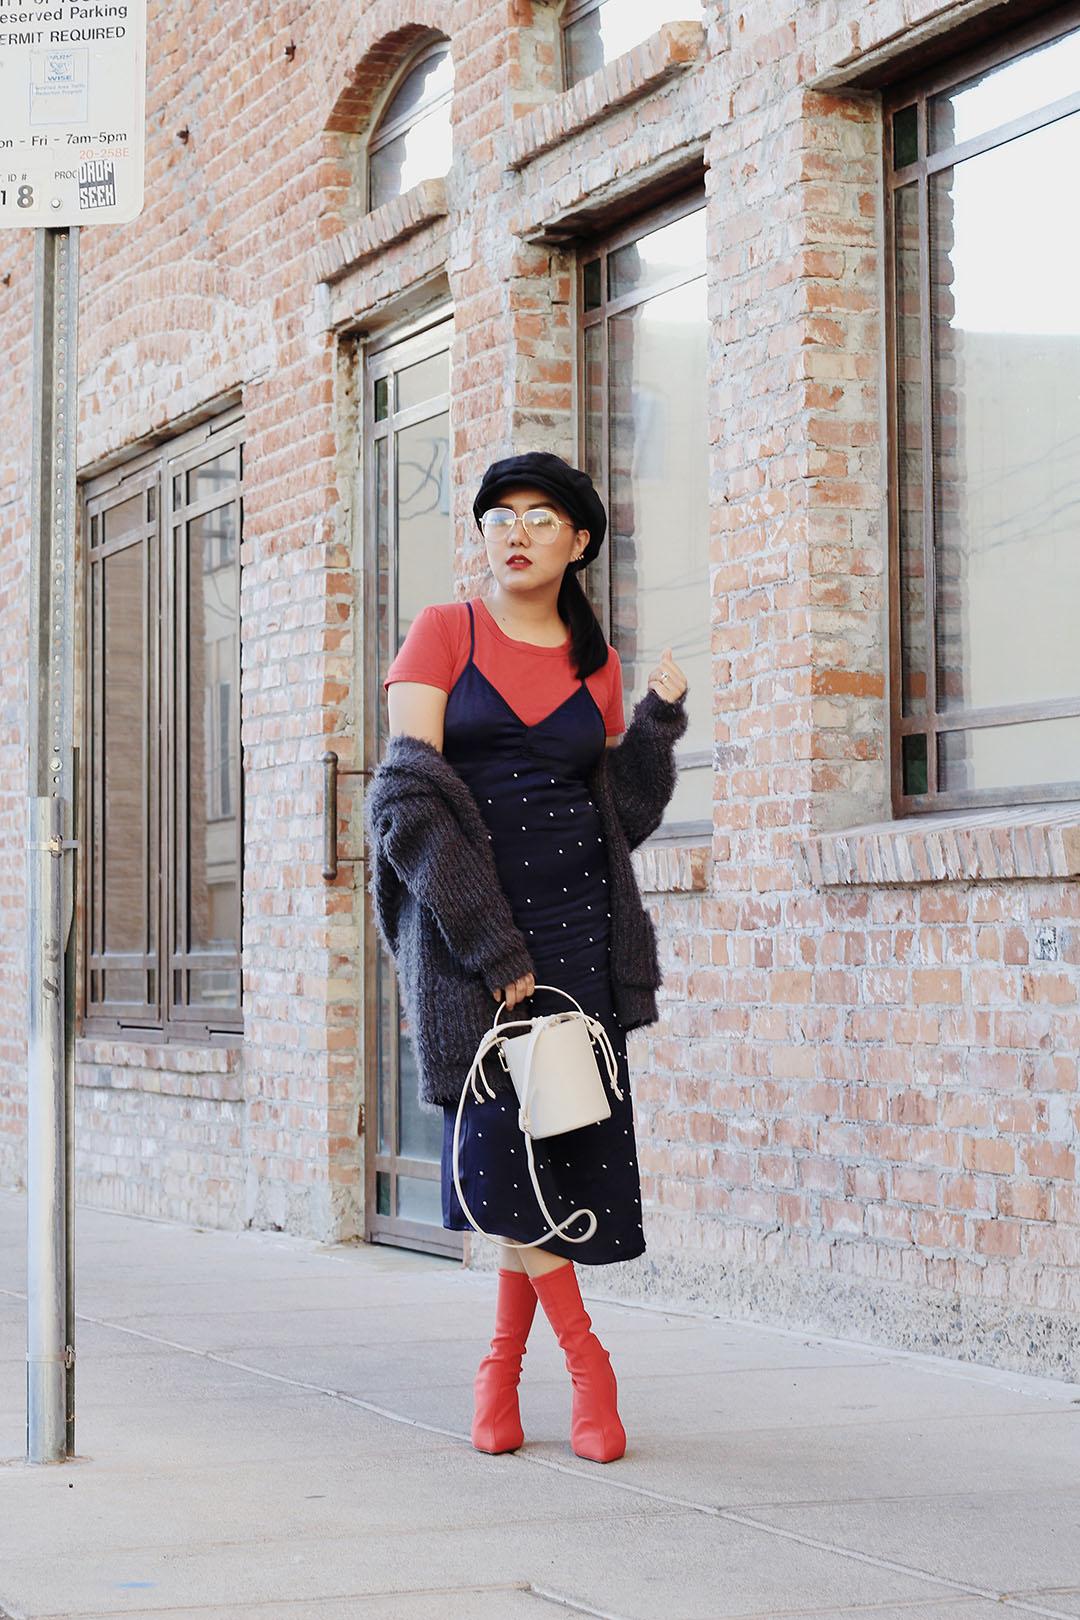 Mini Haul | NA-KD.com and more